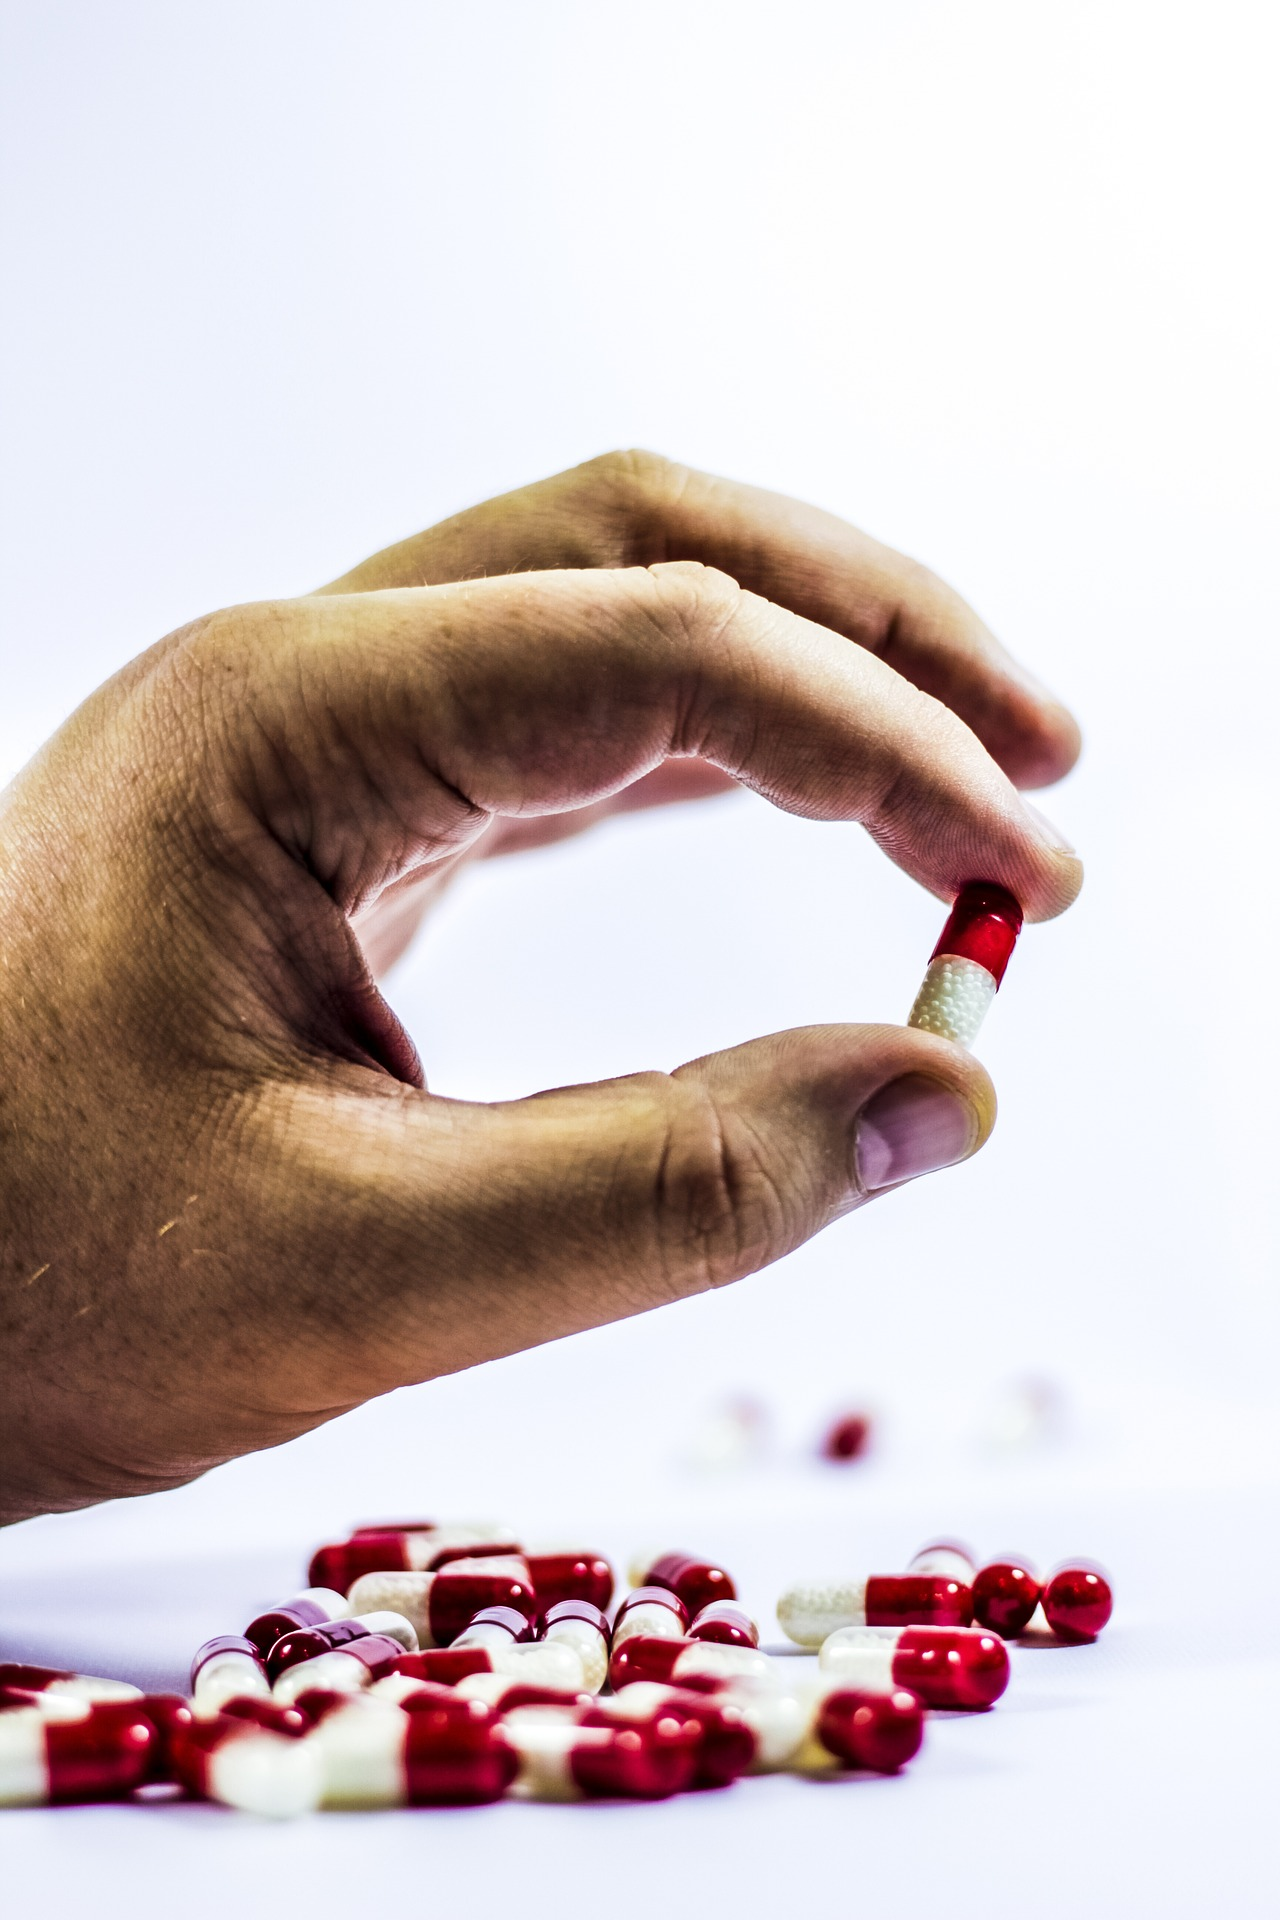 prescription-drugs-employee-benefits